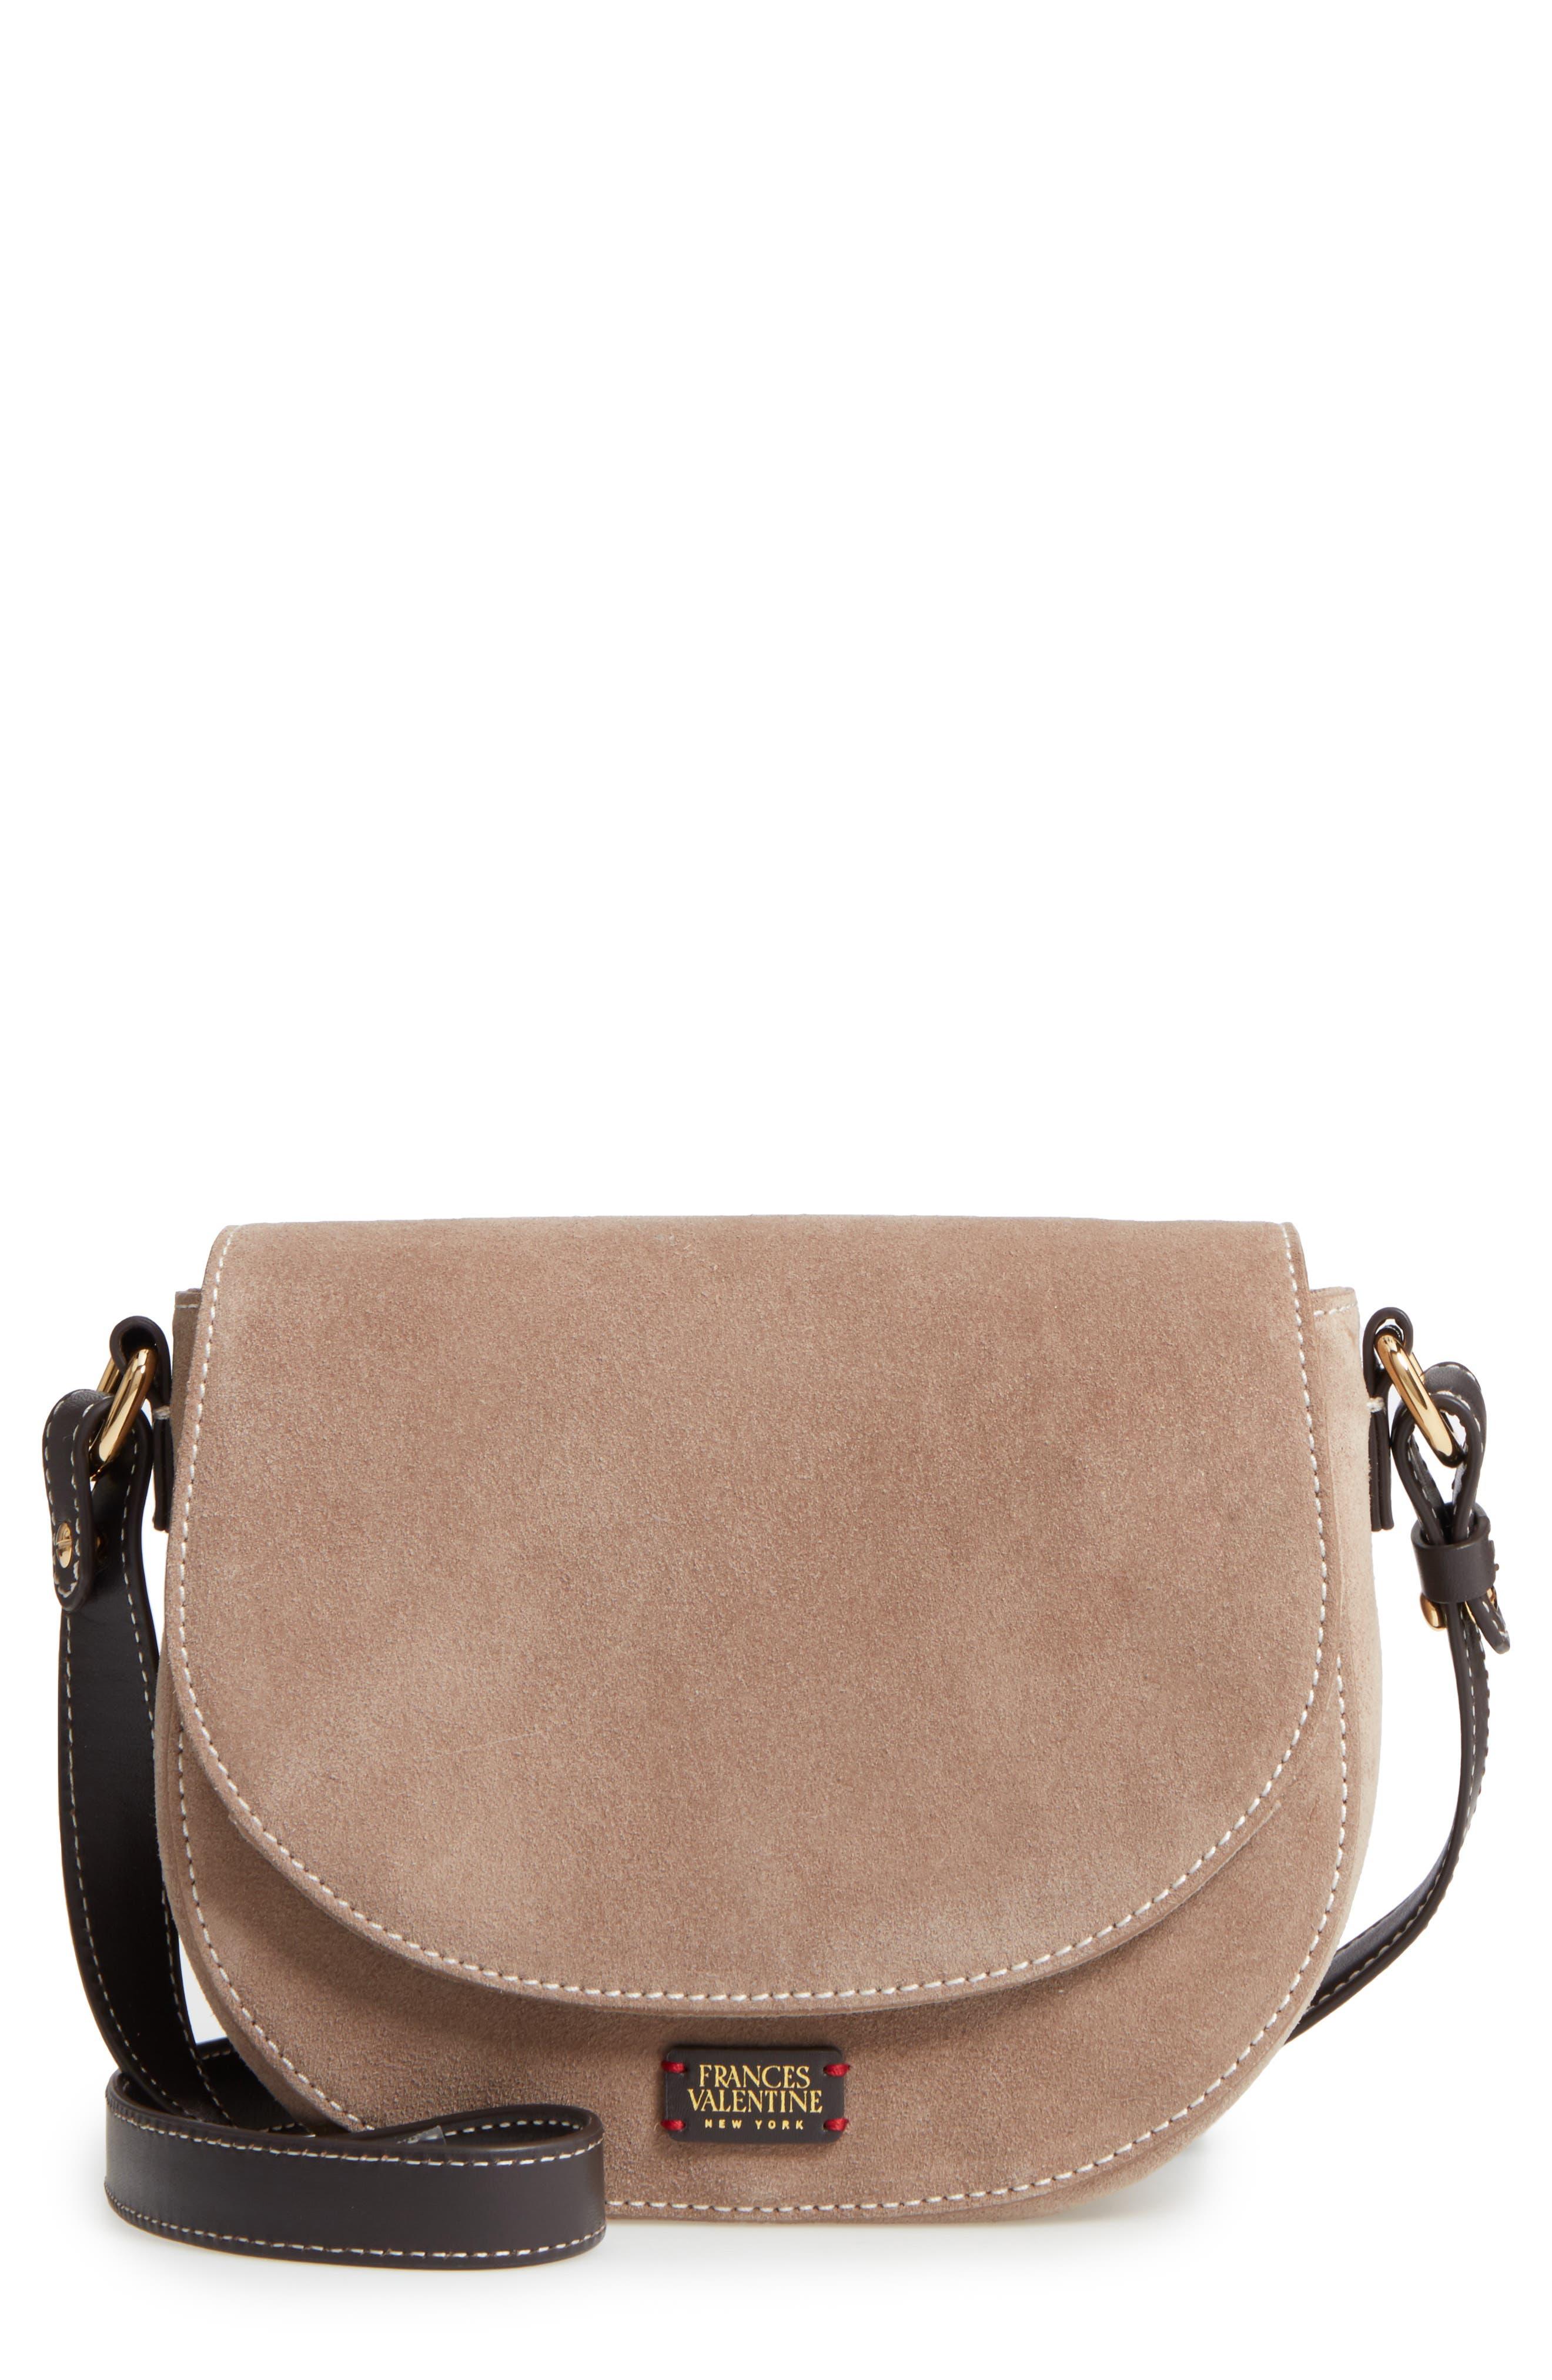 Alternate Image 1 Selected - Frances Valentine Mini Ellen Suede Crossbody Bag